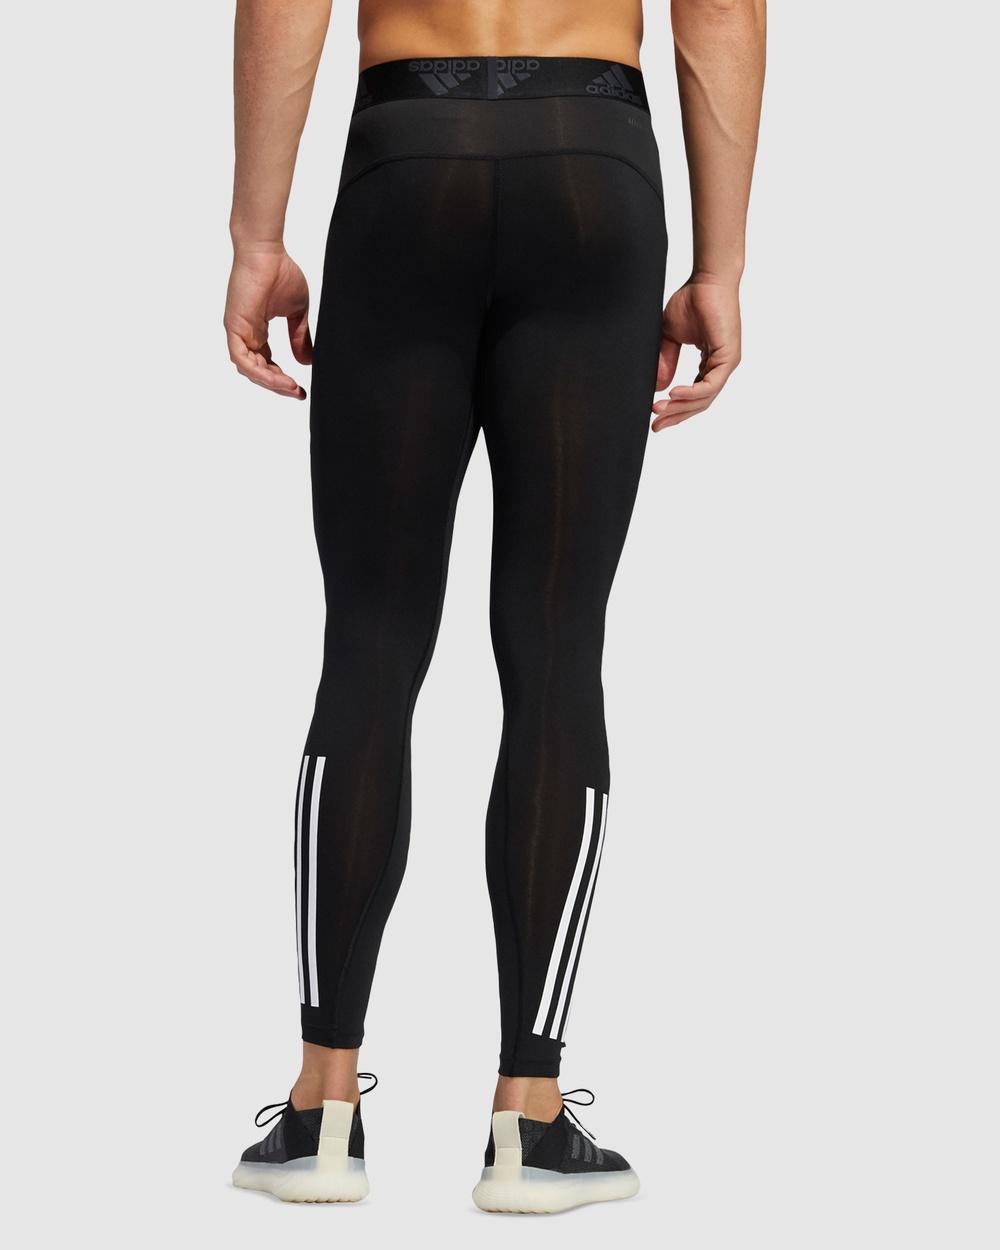 adidas Performance Techfit 3 Stripes Long Tights Sports Black 3-Stripes